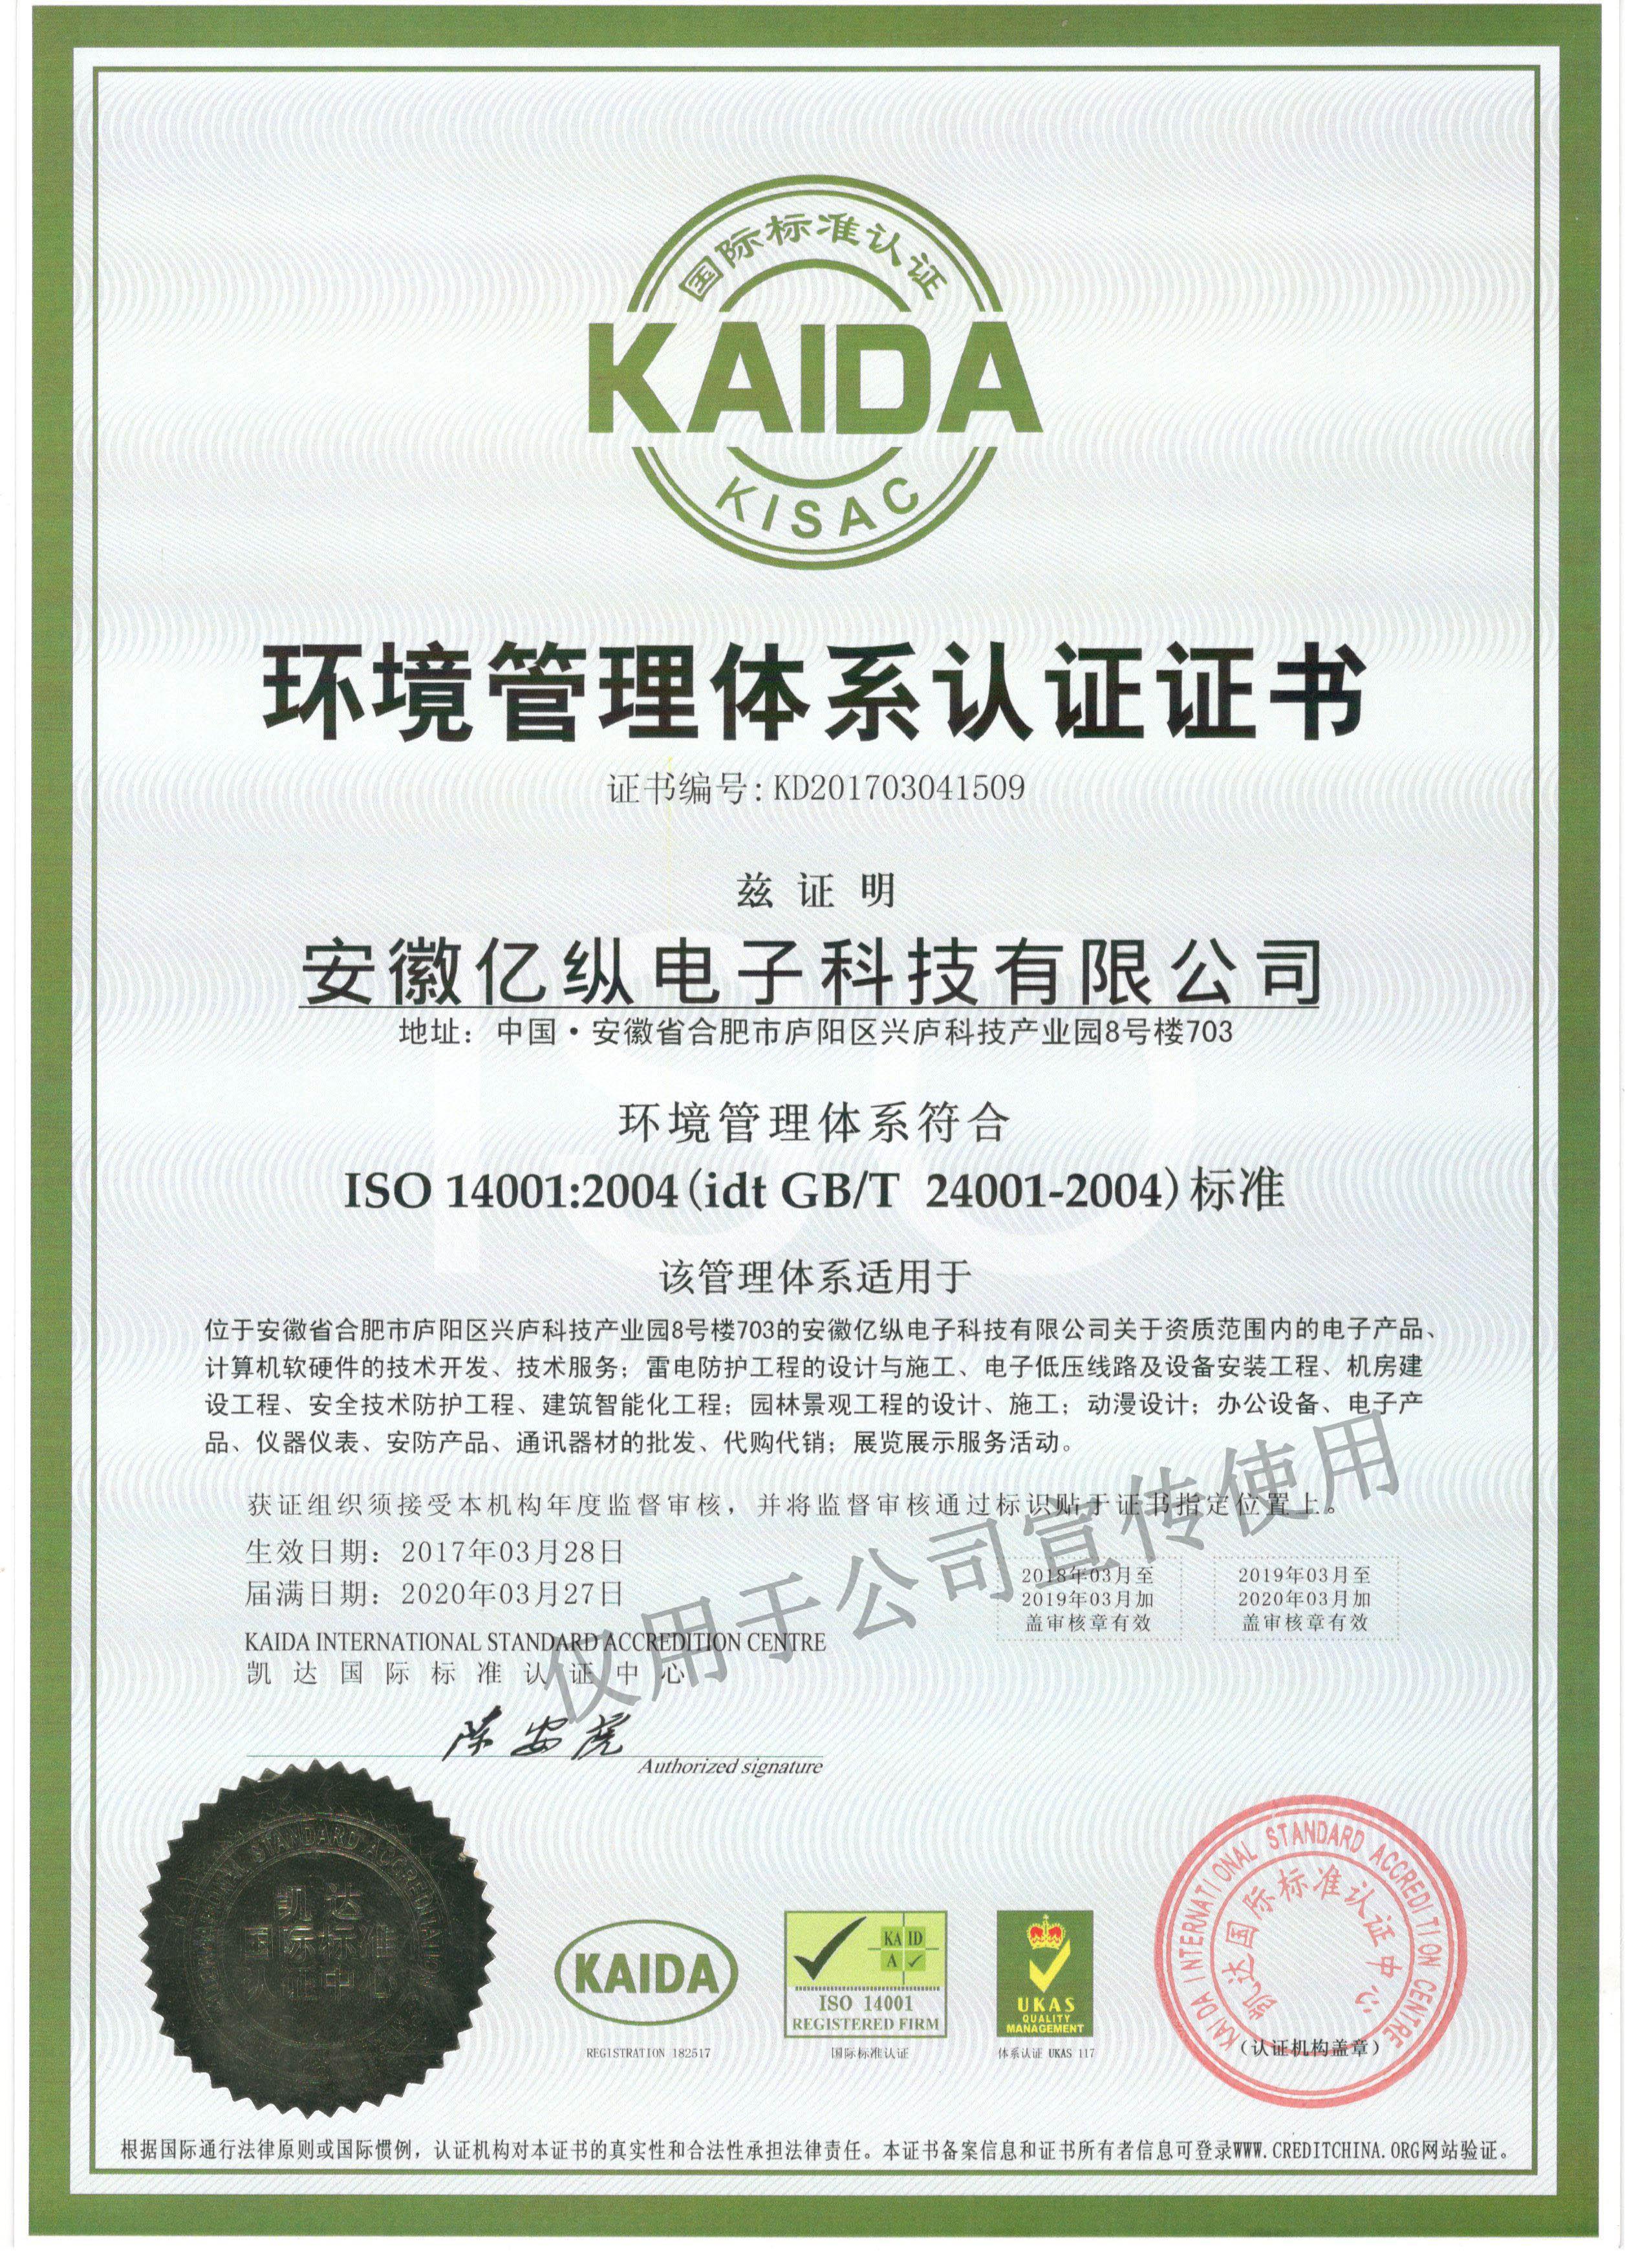 ISO三证2水印.jpg